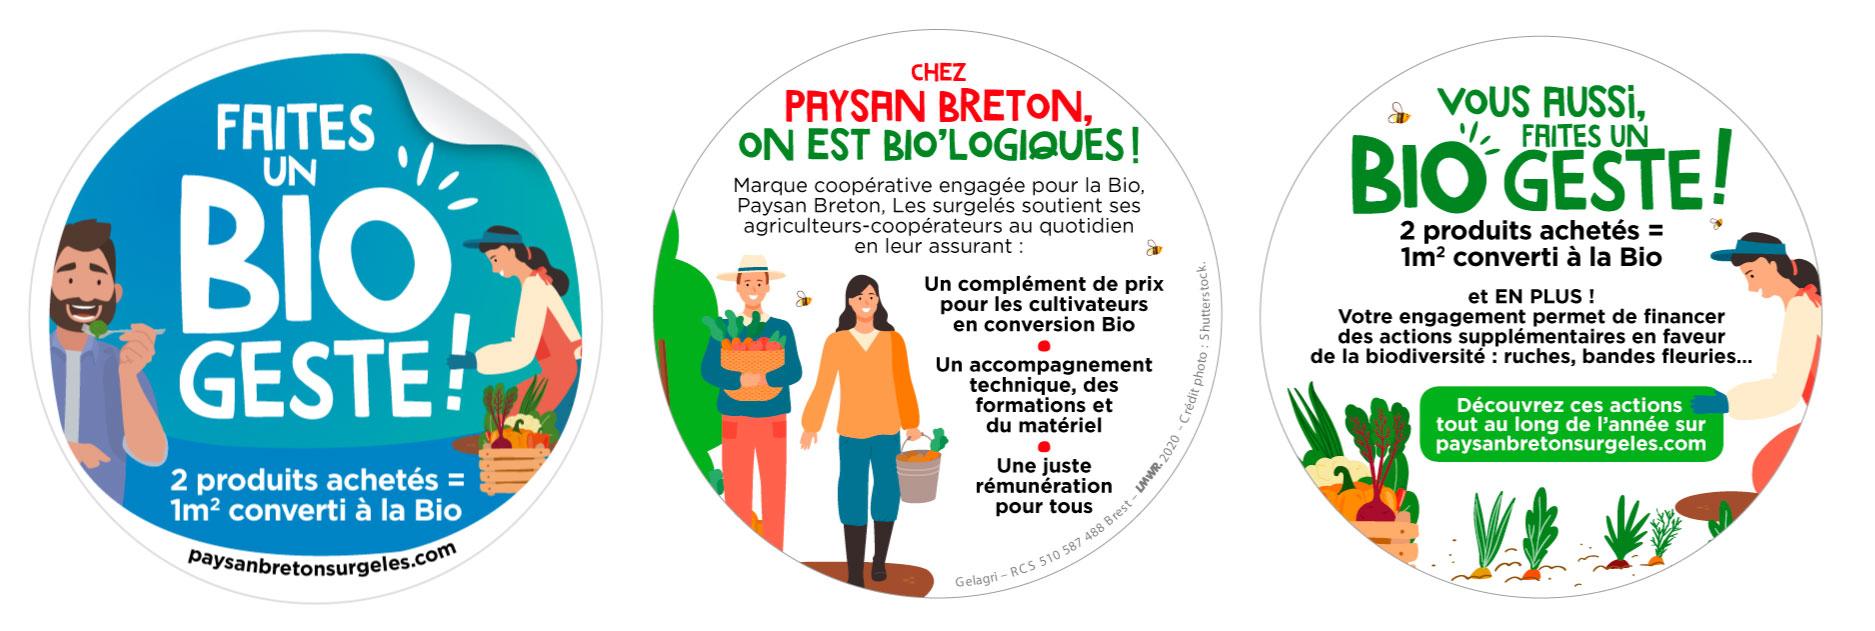 Visuel sticker BIO GESTE Paysan Breton surgeles ope bio 2021 - Faites un Bio geste ! avec Paysan Breton Les surgelés